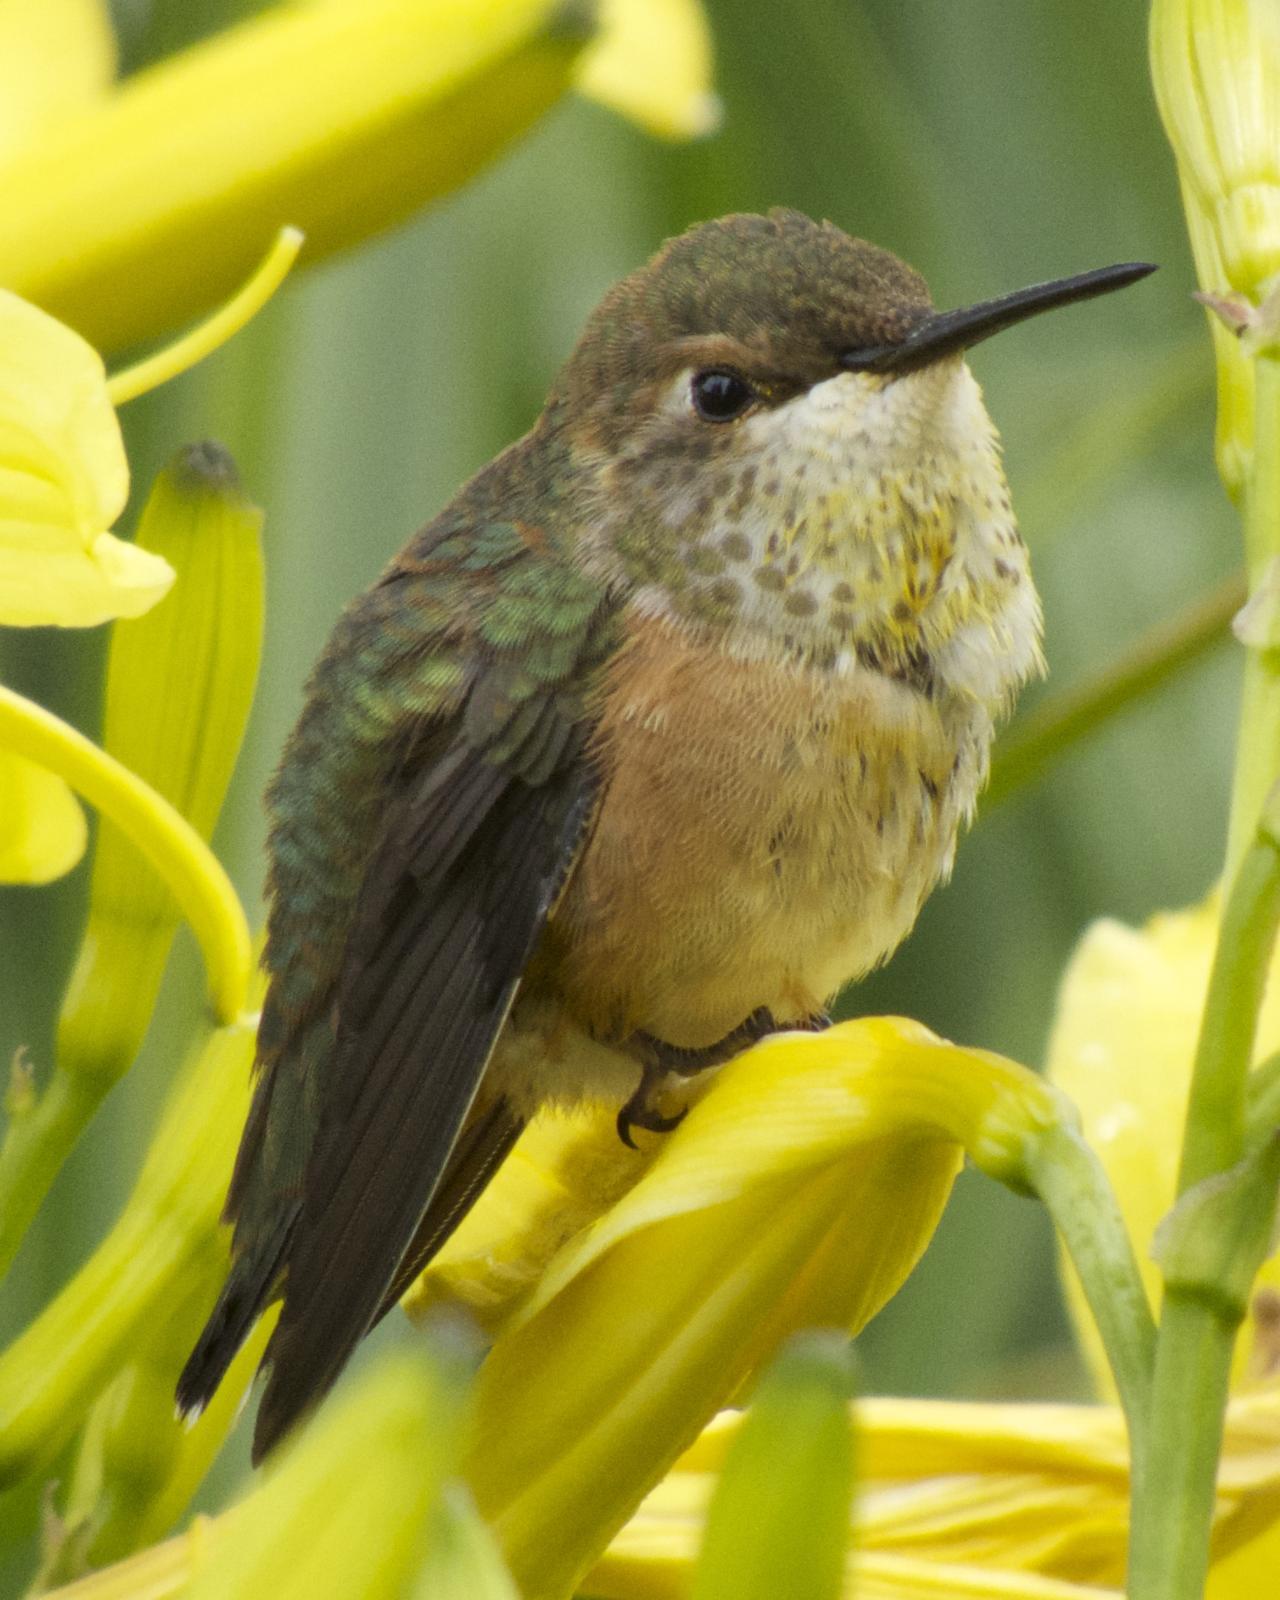 Rufous Hummingbird Photo by Robin Barker